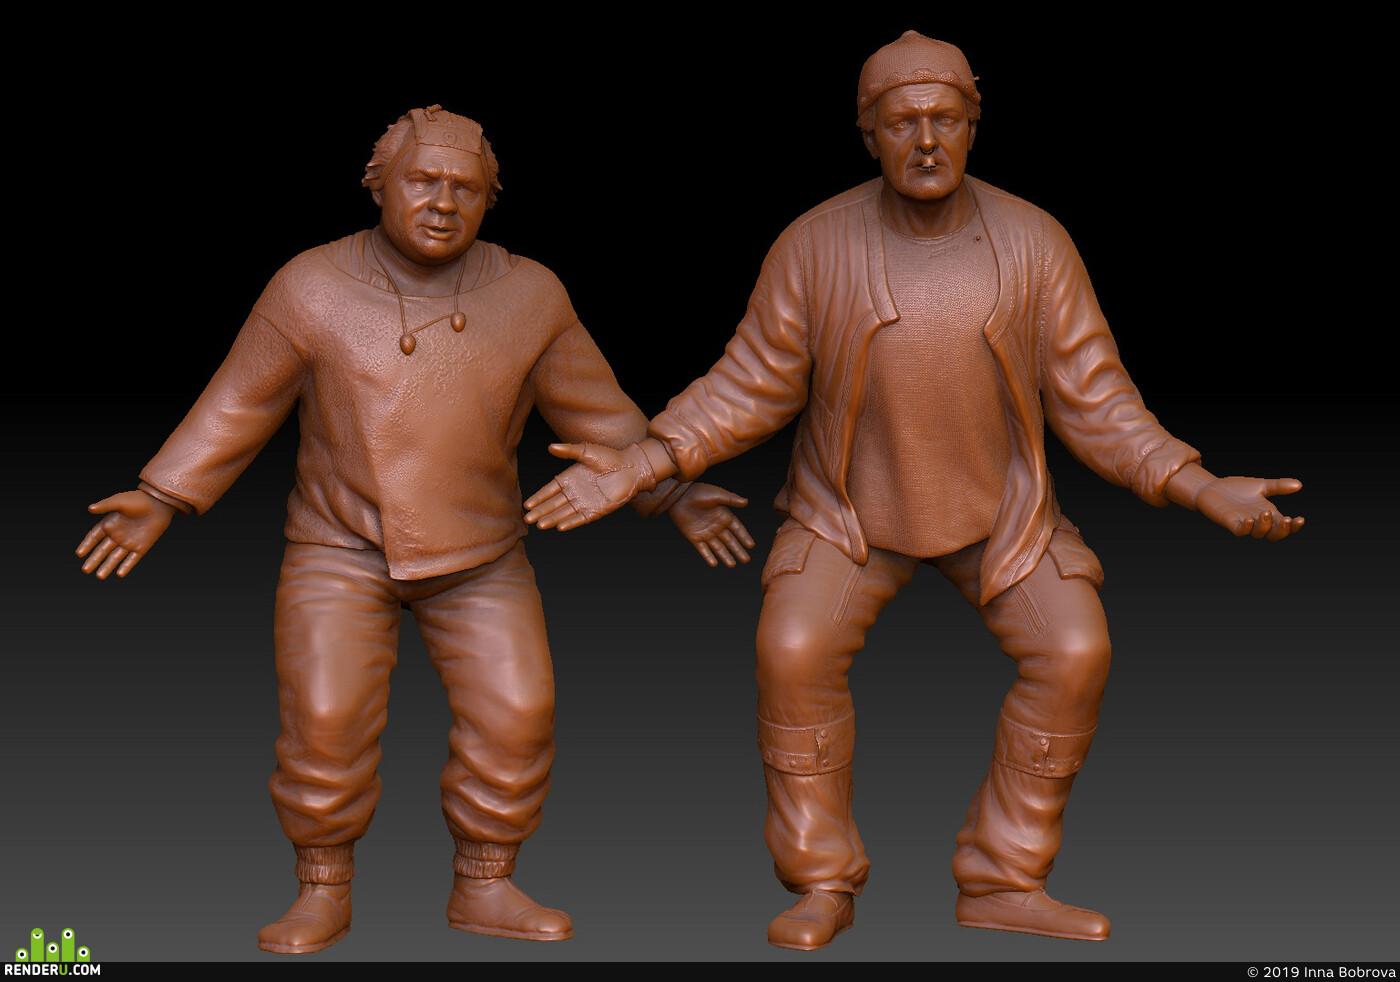 3dprint, ZBrush, stl, 3d_modeling, 3d_sculpture, 3d_character, 3д скульптура, Леонов, 3д скульптура Леонова, 3д скульптура Яковлева